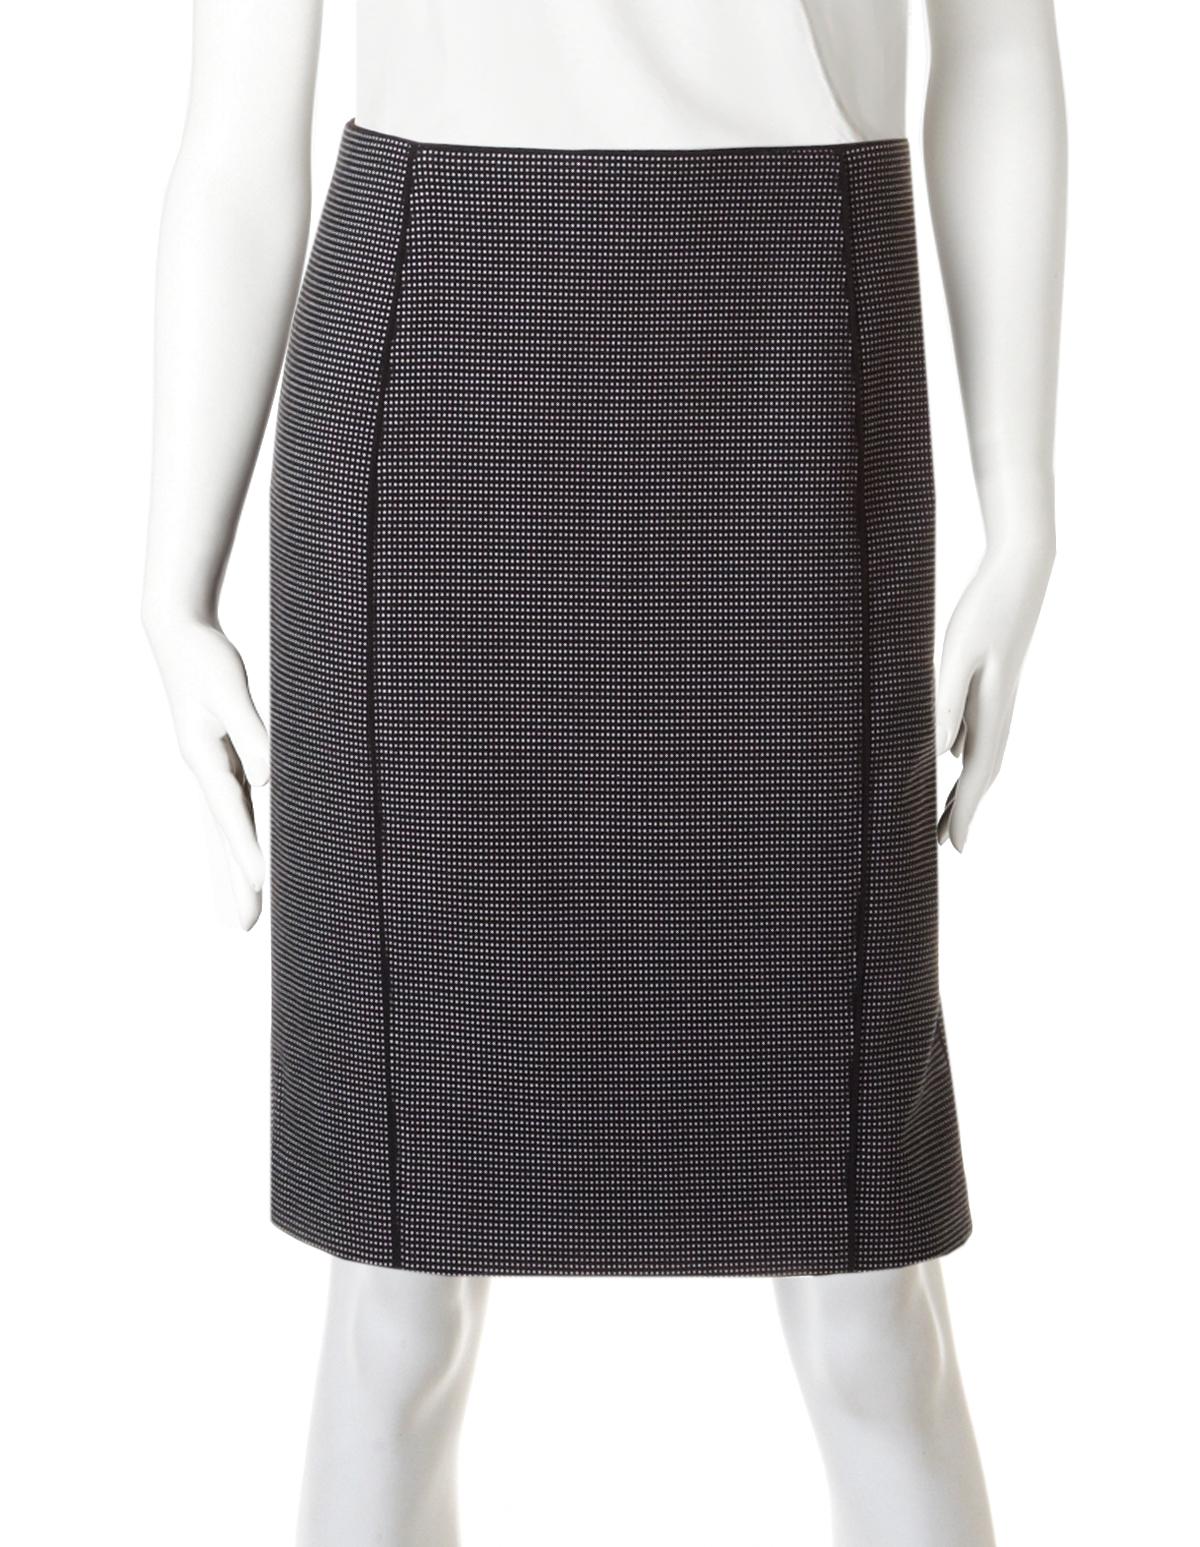 67401ab43 Birdseye Ruffle Hem Pencil Skirt, Black/White, hi-res